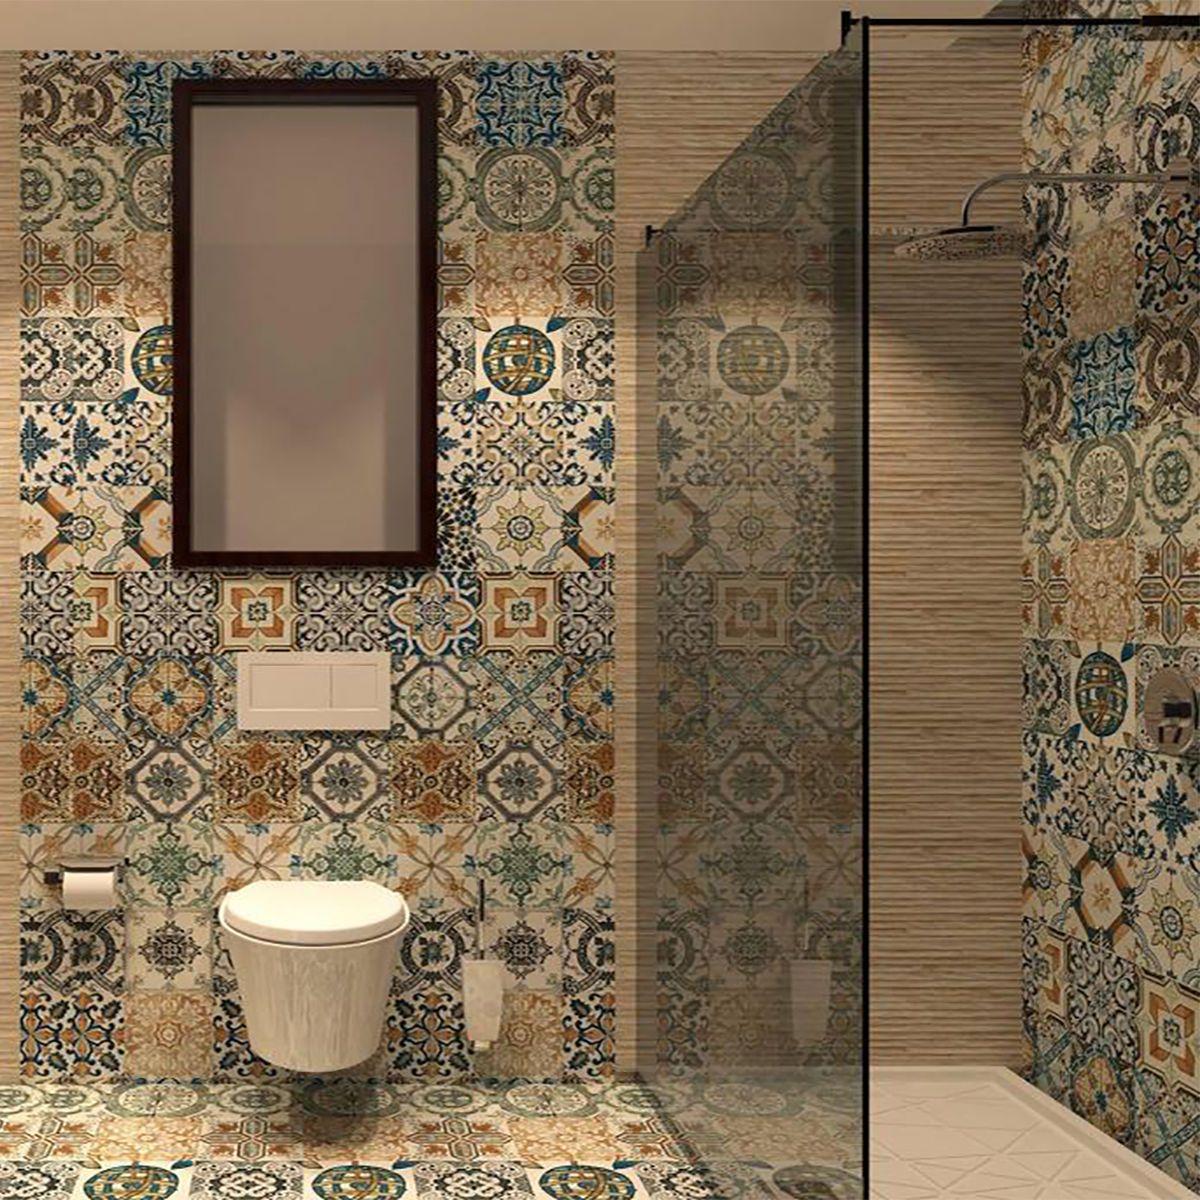 10x10cm Sample Of 20x20cm Nikea Matt Multi Colour Porcelain Wall And Floor Tiles Best Bathroom Flooring Trendy Bathroom Tiles Bathroom Decor